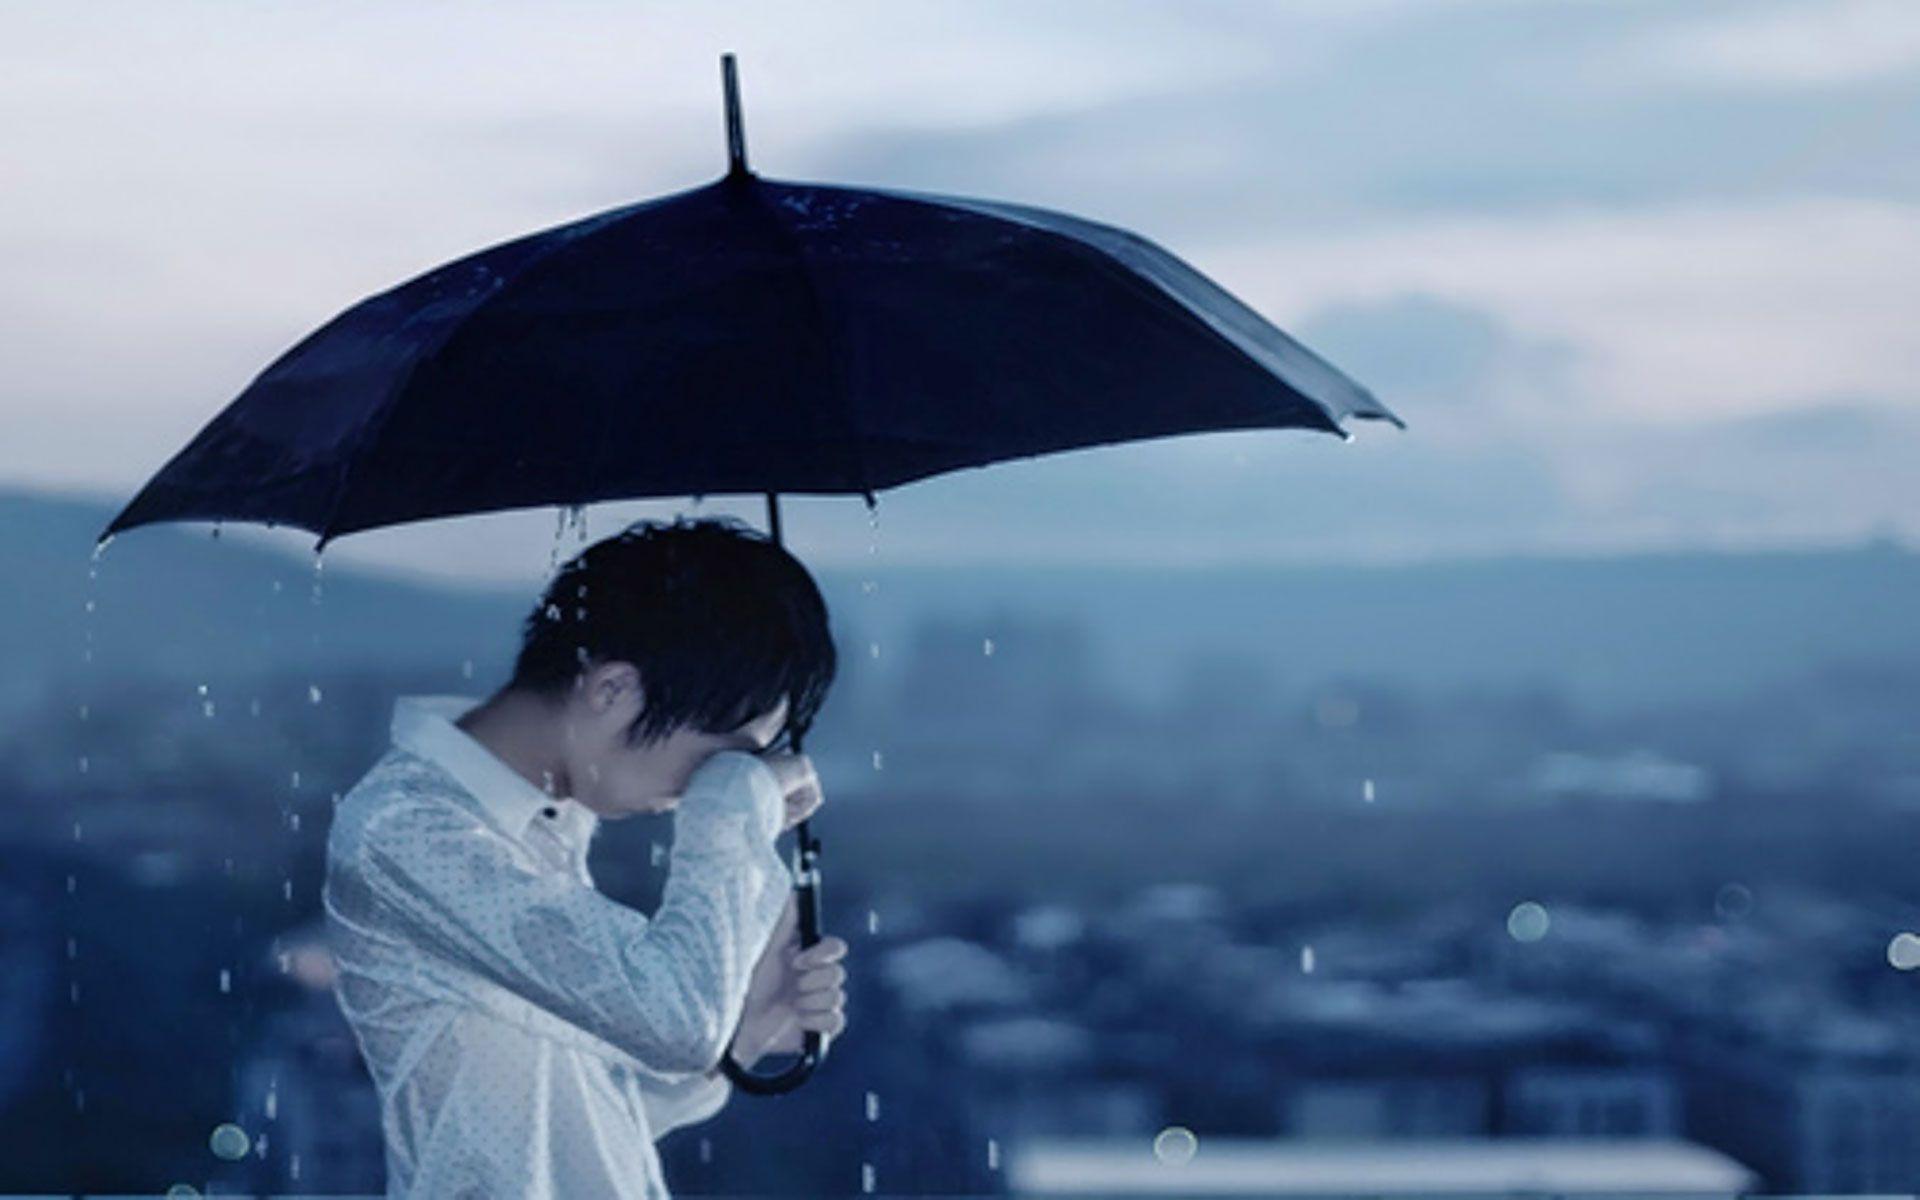 Sad Boy In Rain Hd Wallpapers Wallpaper Cave